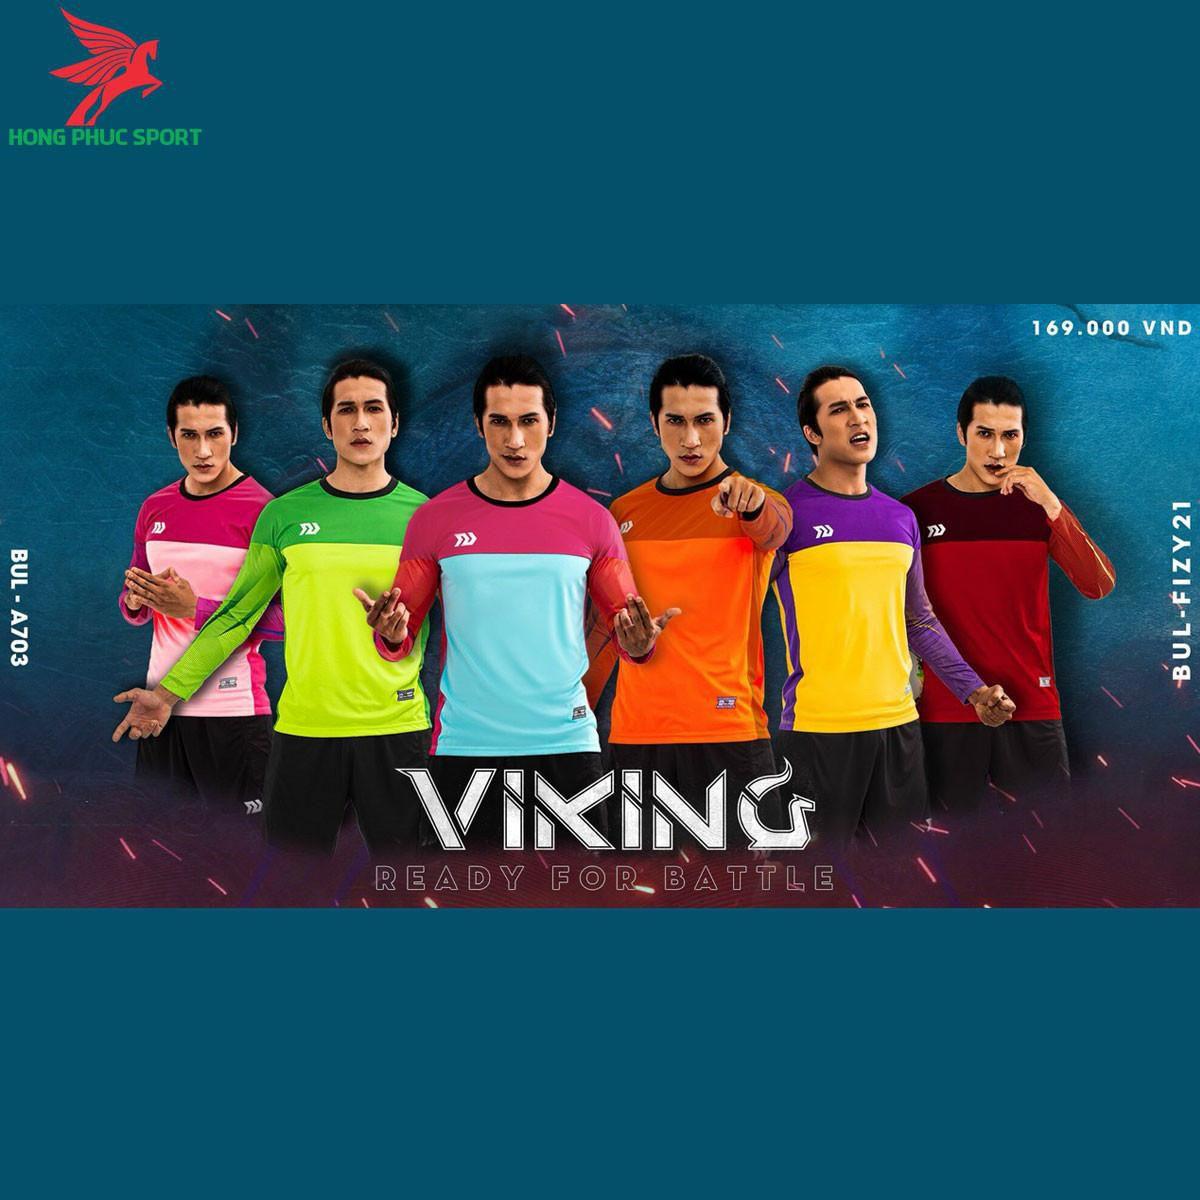 https://cdn.hongphucsport.com/unsafe/s4.shopbay.vn/files/285/ao-thu-mon-khong-logo-bulbal-viking-2-60516151e07f7.jpg